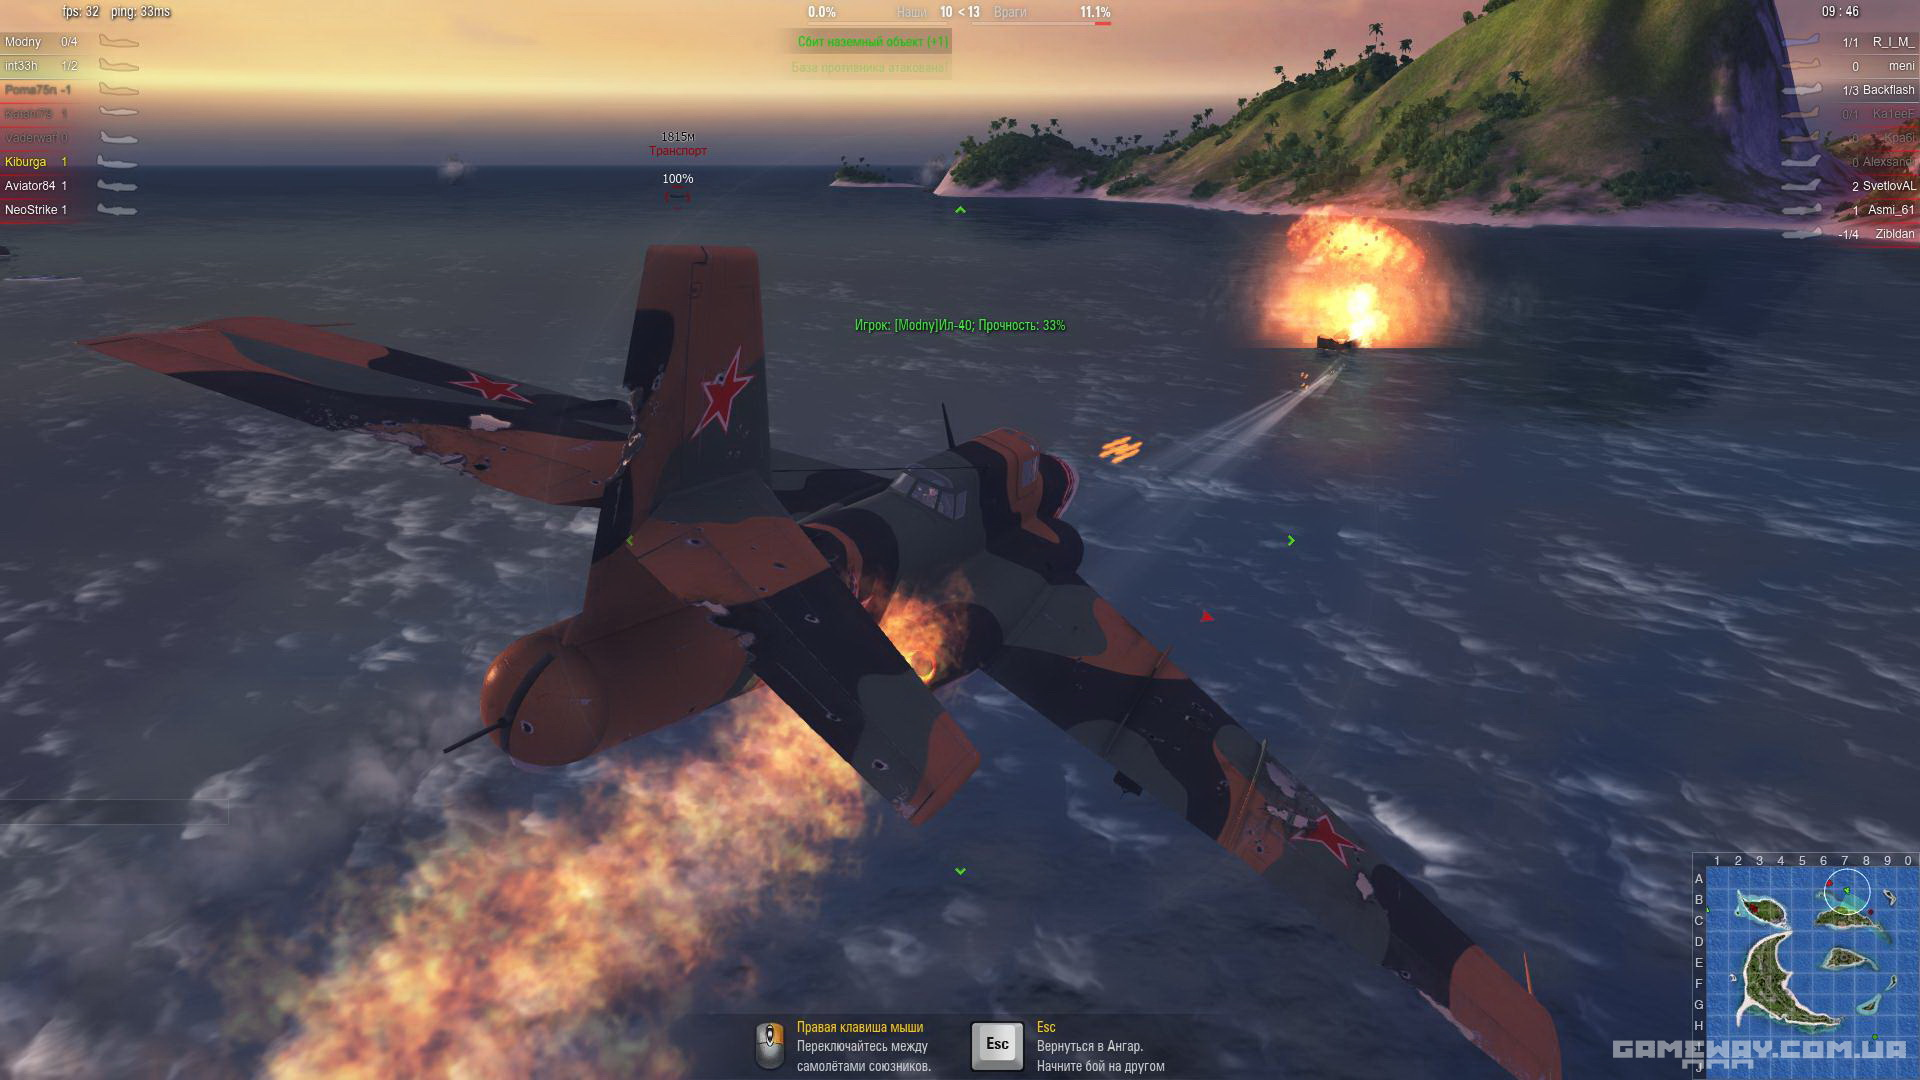 скриншоты геймплея world of warplanes збт